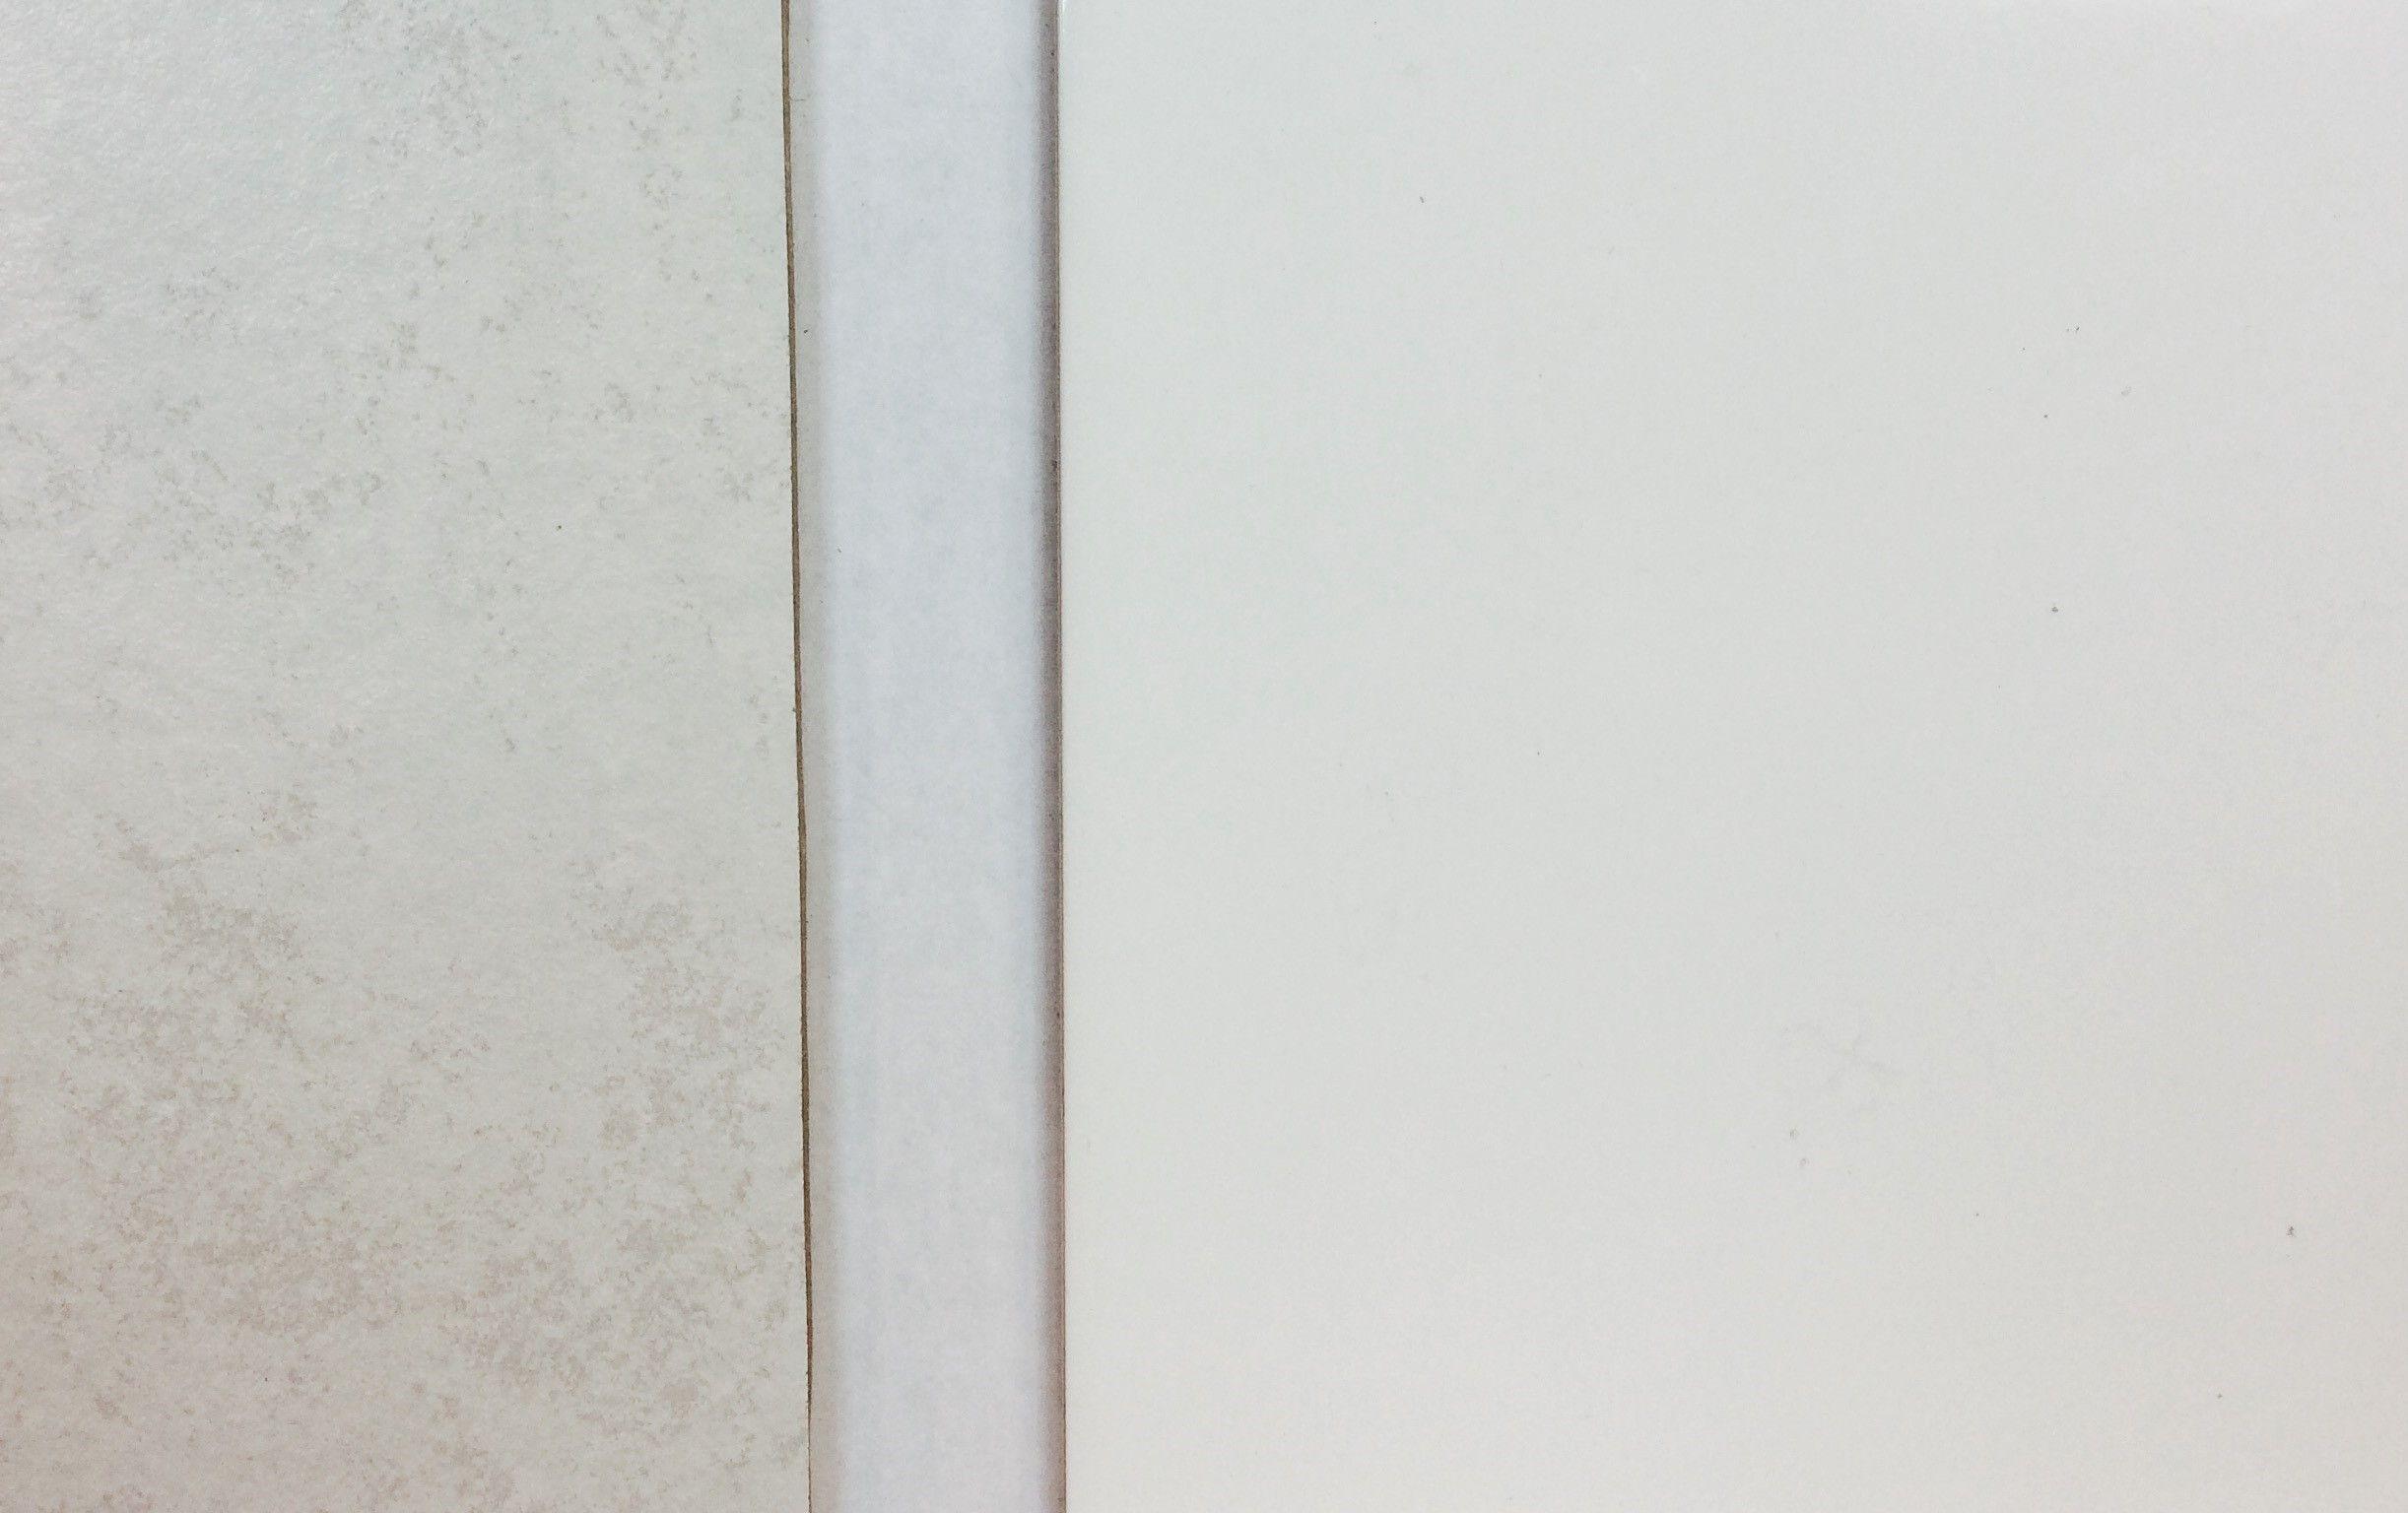 Level 2 Bath Tile 13x13 Ceramic Floor Tile With 8x10 Glossy